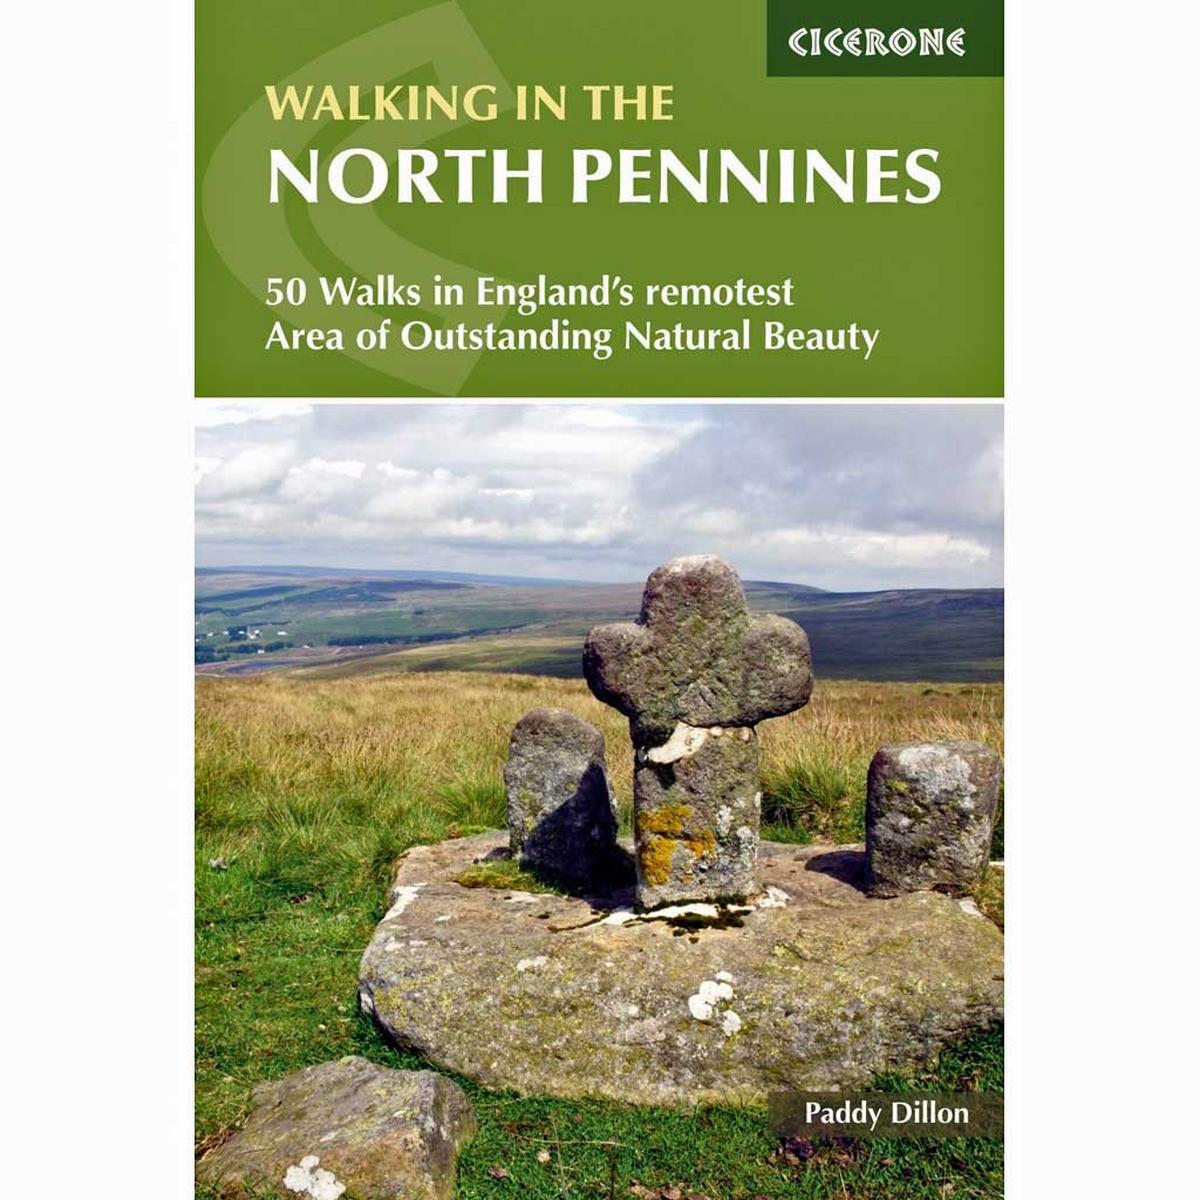 Cicerone Guidebook - Walking in the North Pennines